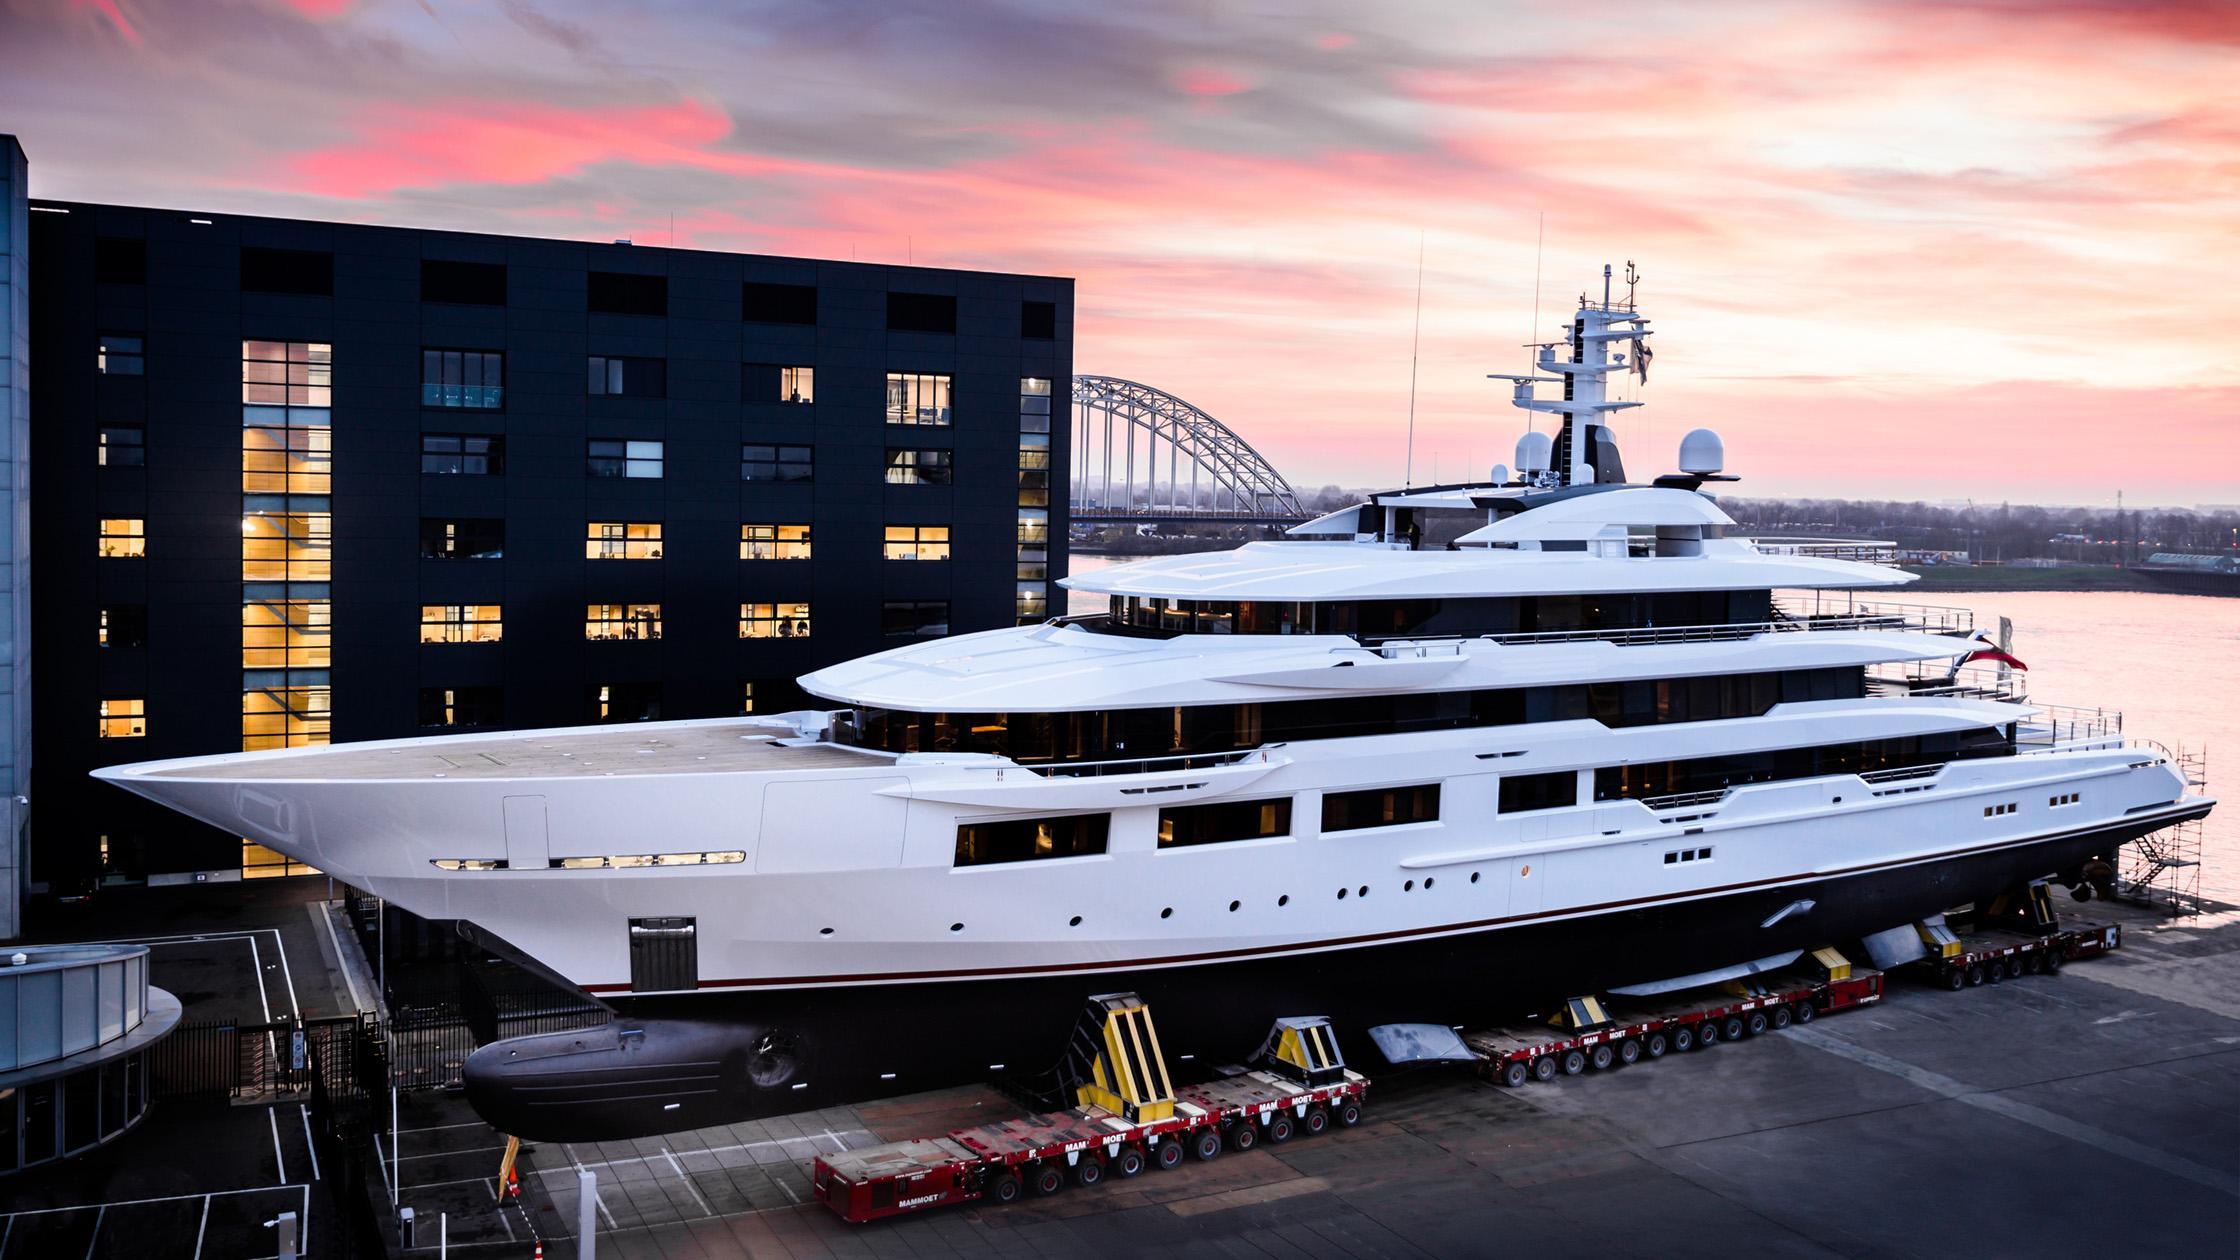 dreamboat y716 motoryacht oceanco 90m 2019 launch half profile